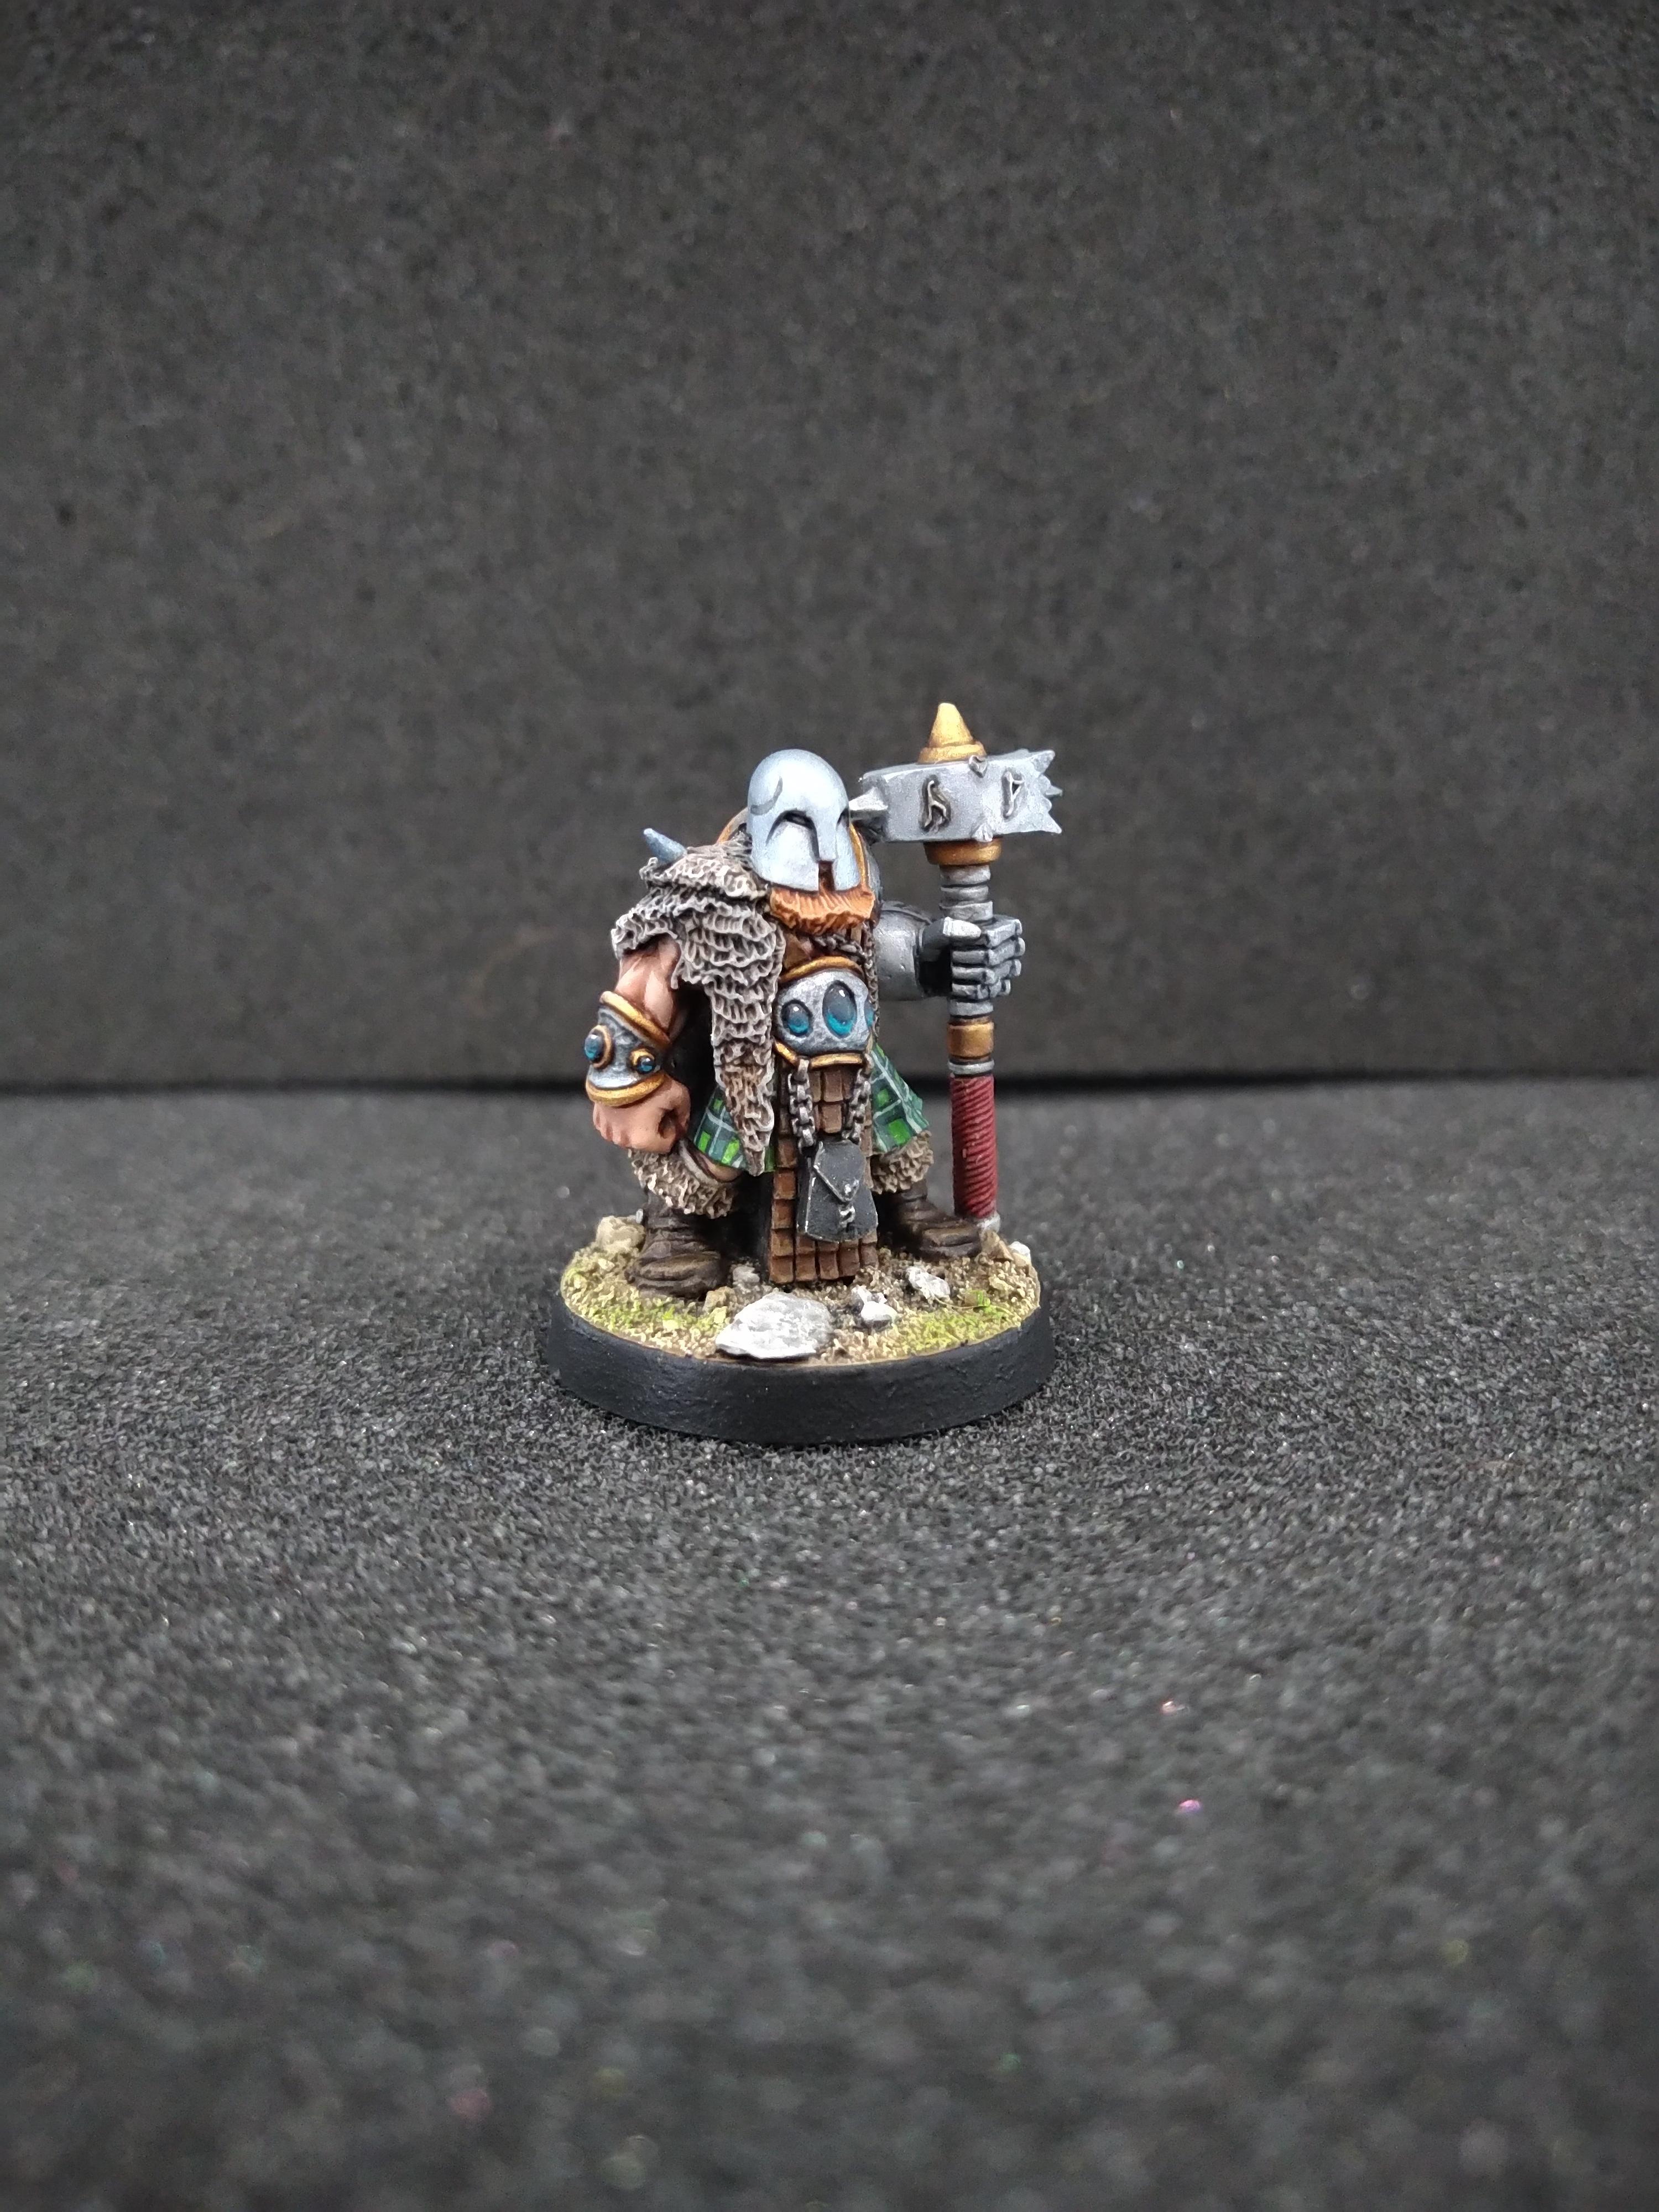 Dwarves, Free, Hassle, Hasslefree, Kain, Miniature, Miniatures